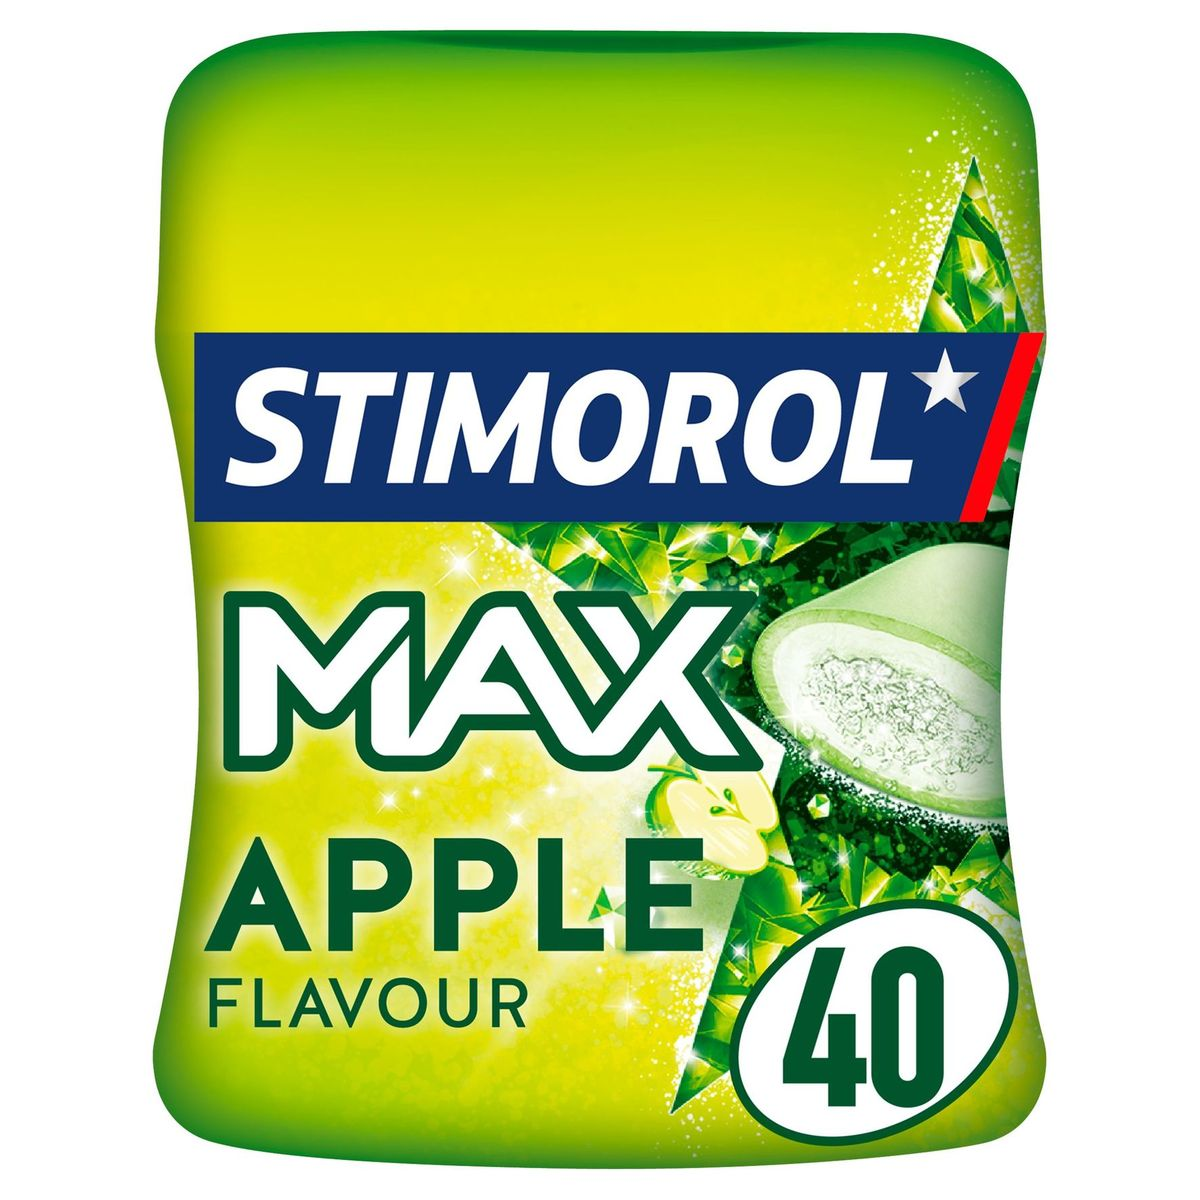 Stimorol Max Frost Apple Flavour Sugar Free 80 g